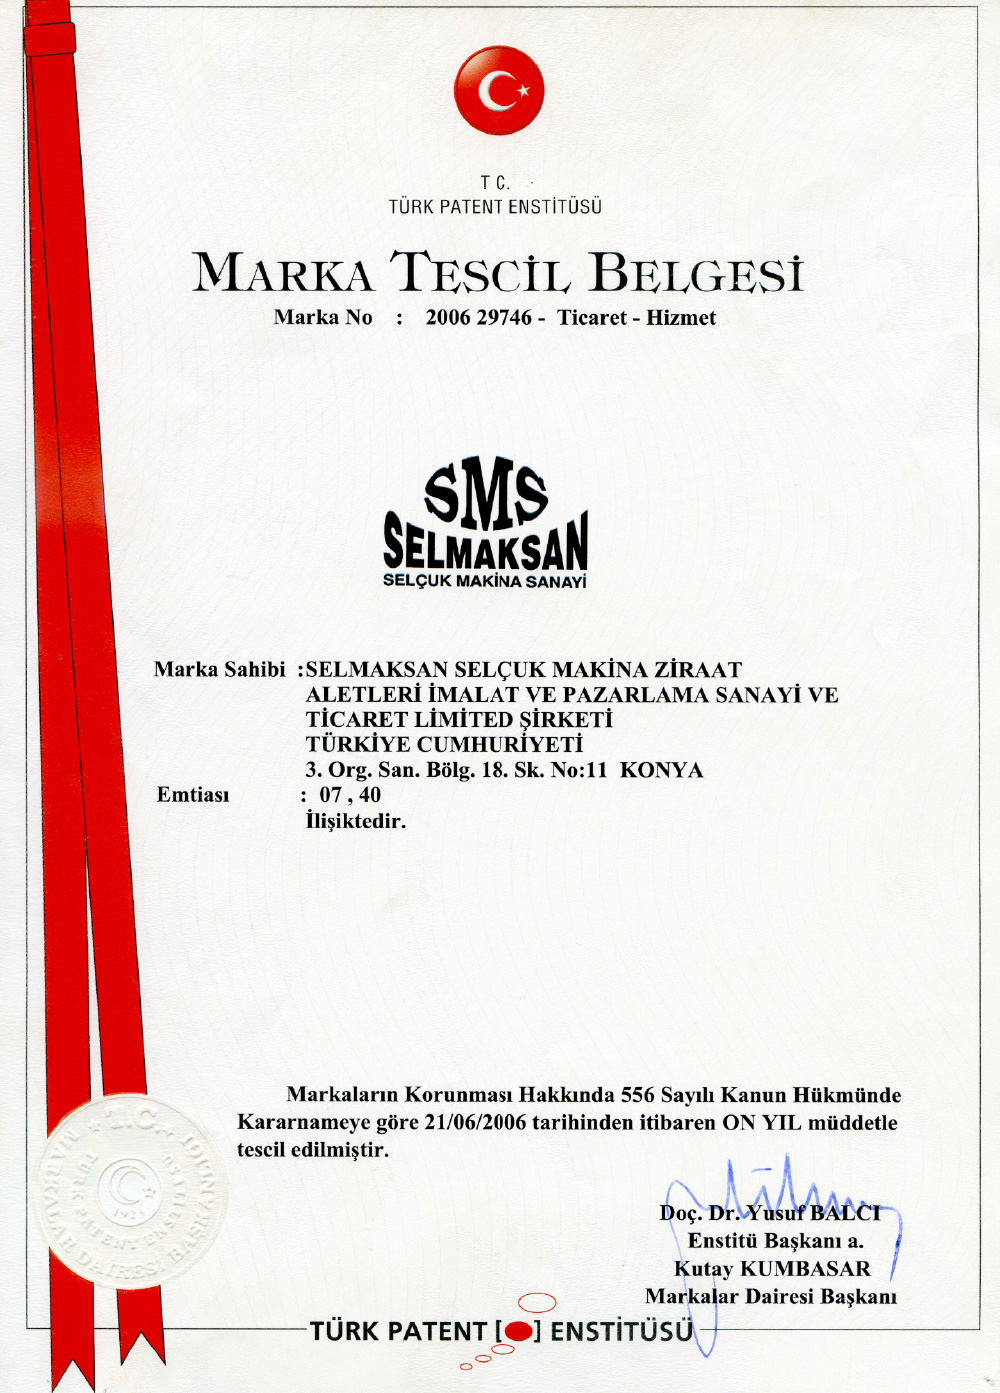 Markenregistrierungszertifikat